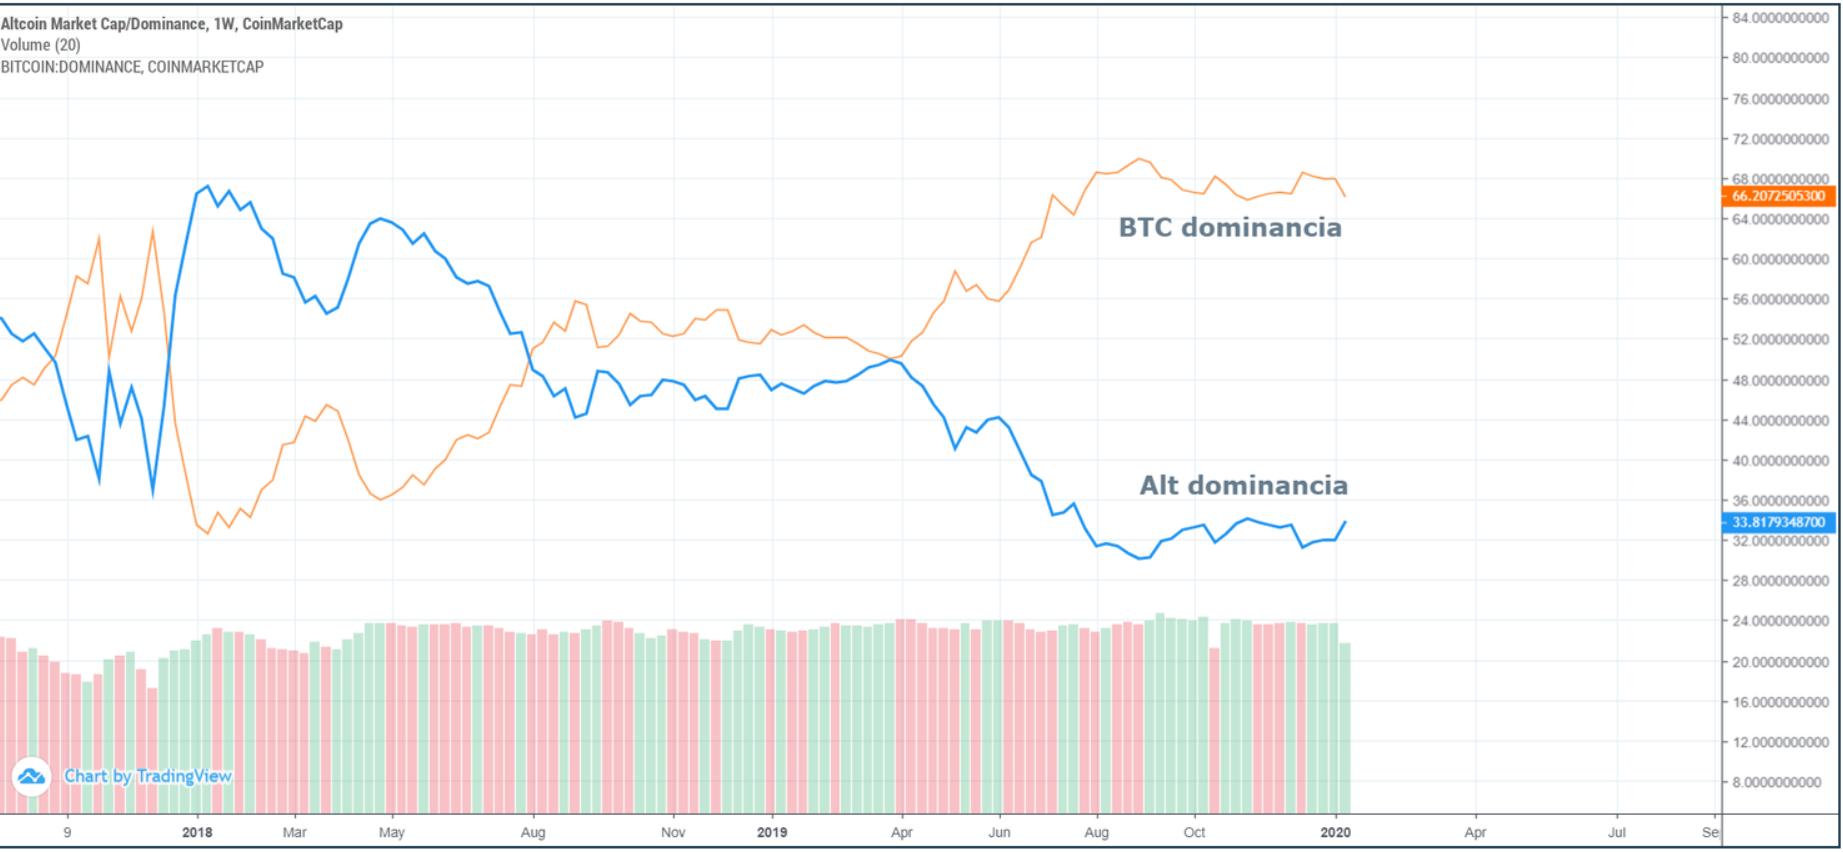 Kriptovaluta piac - dominancia